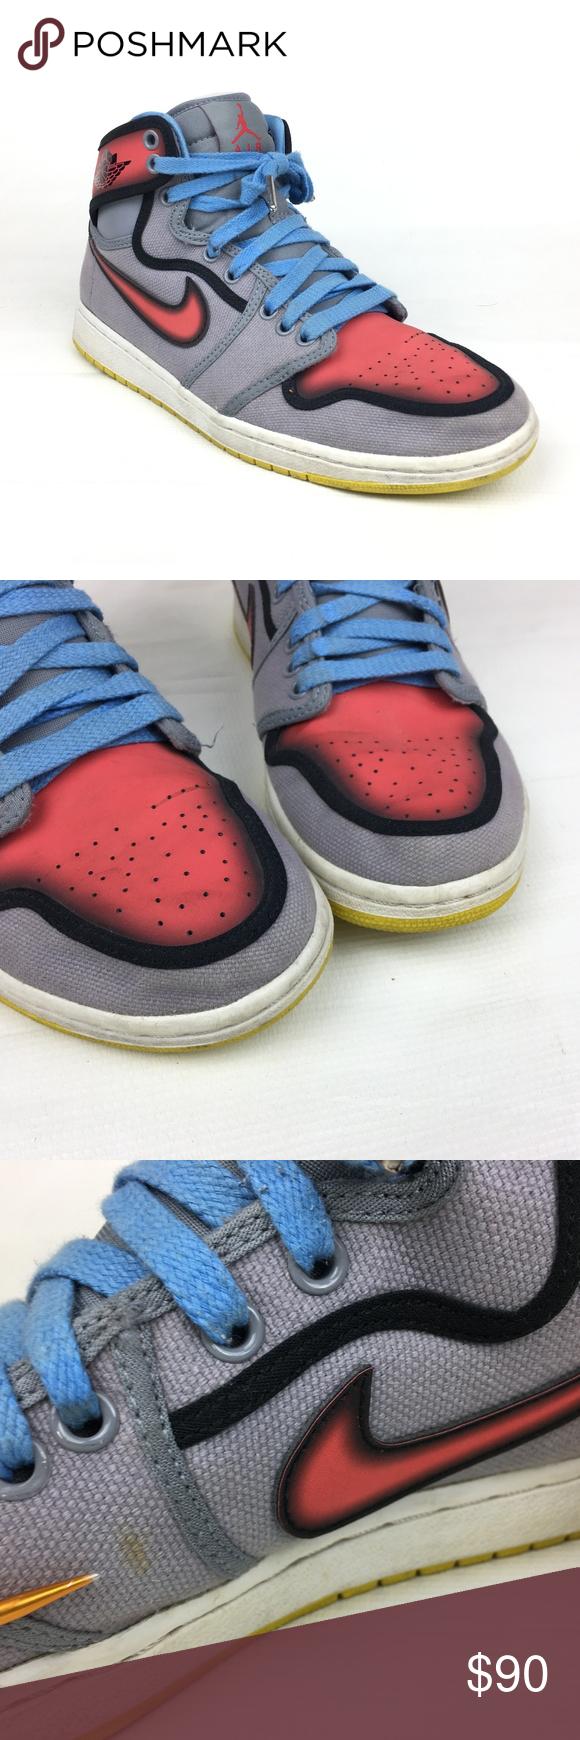 Rare Nike Air Jordan 1 Retro Ajko Rttg Sunburst 9 Rare Nikes Air Jordans Nike Air Jordan